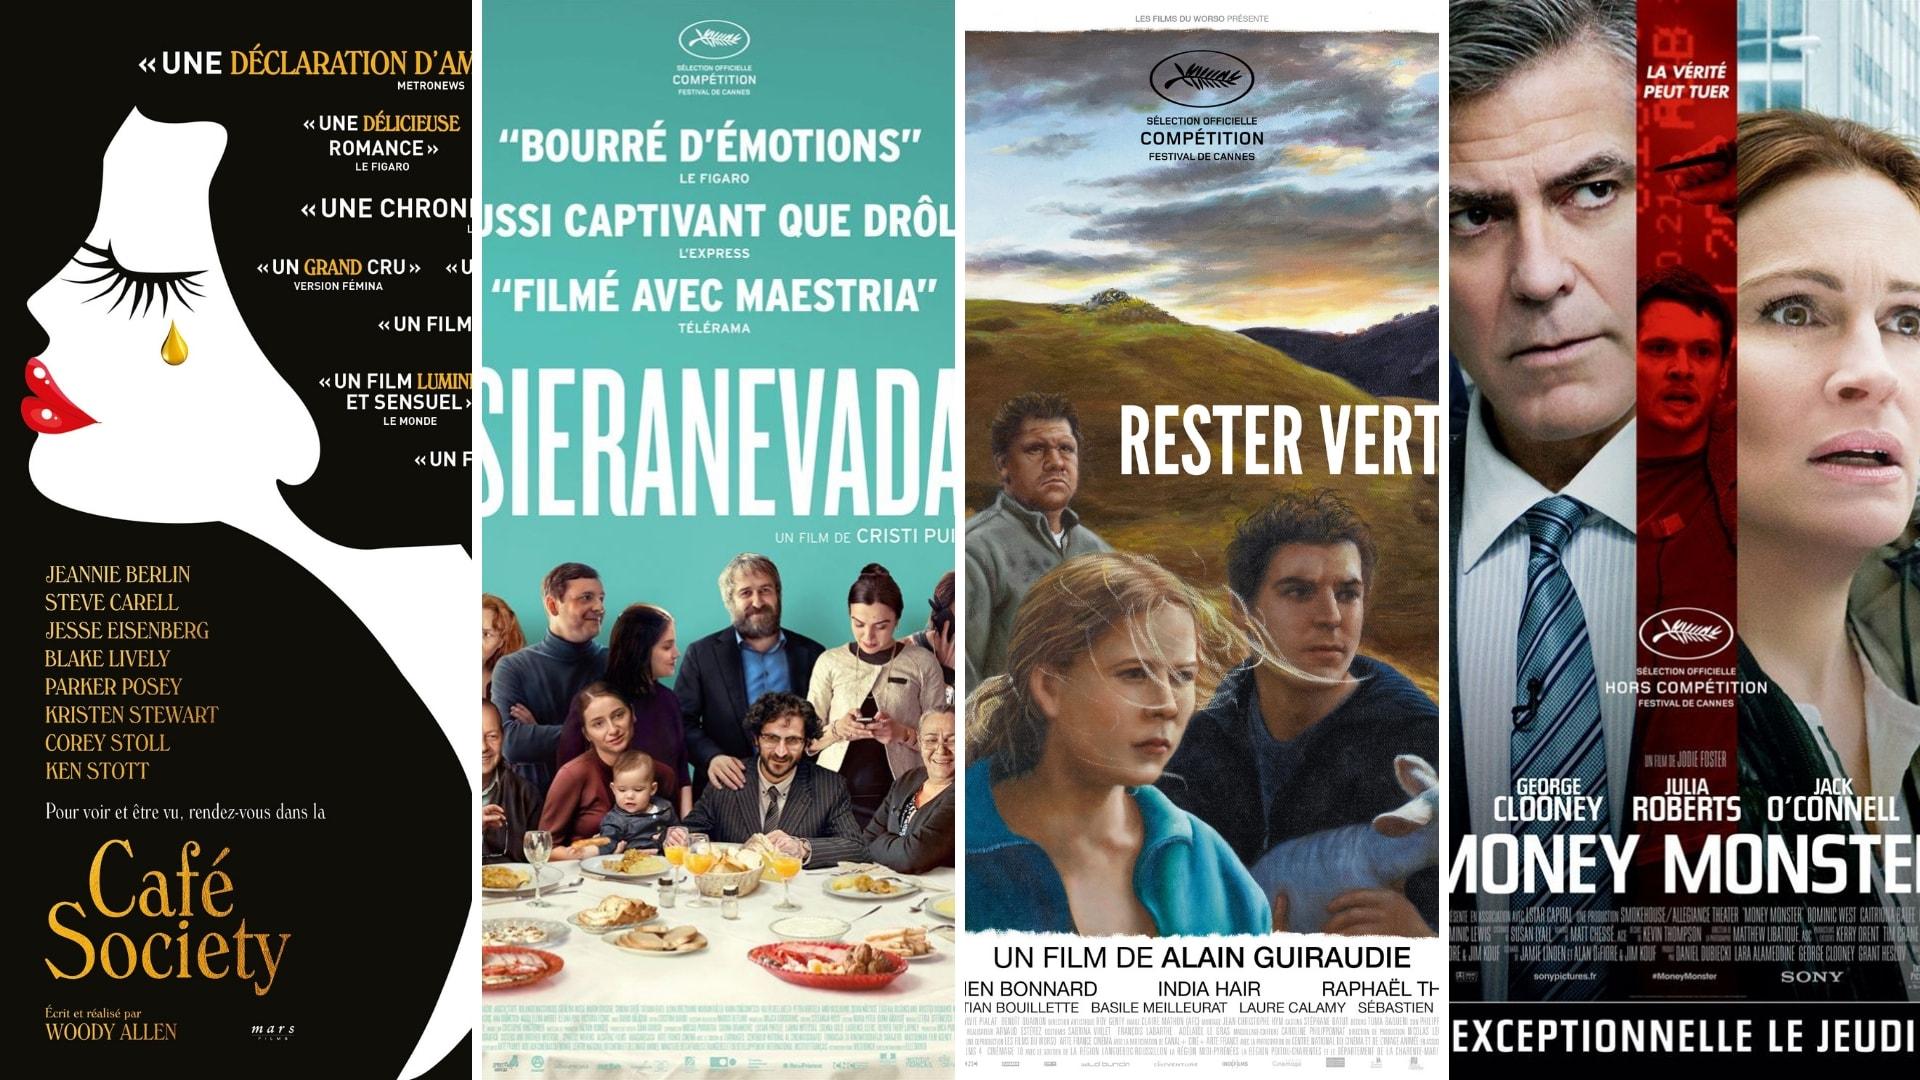 affiches Café Society, Sieranevada, Rester Vertical et Money Monster films cinéma